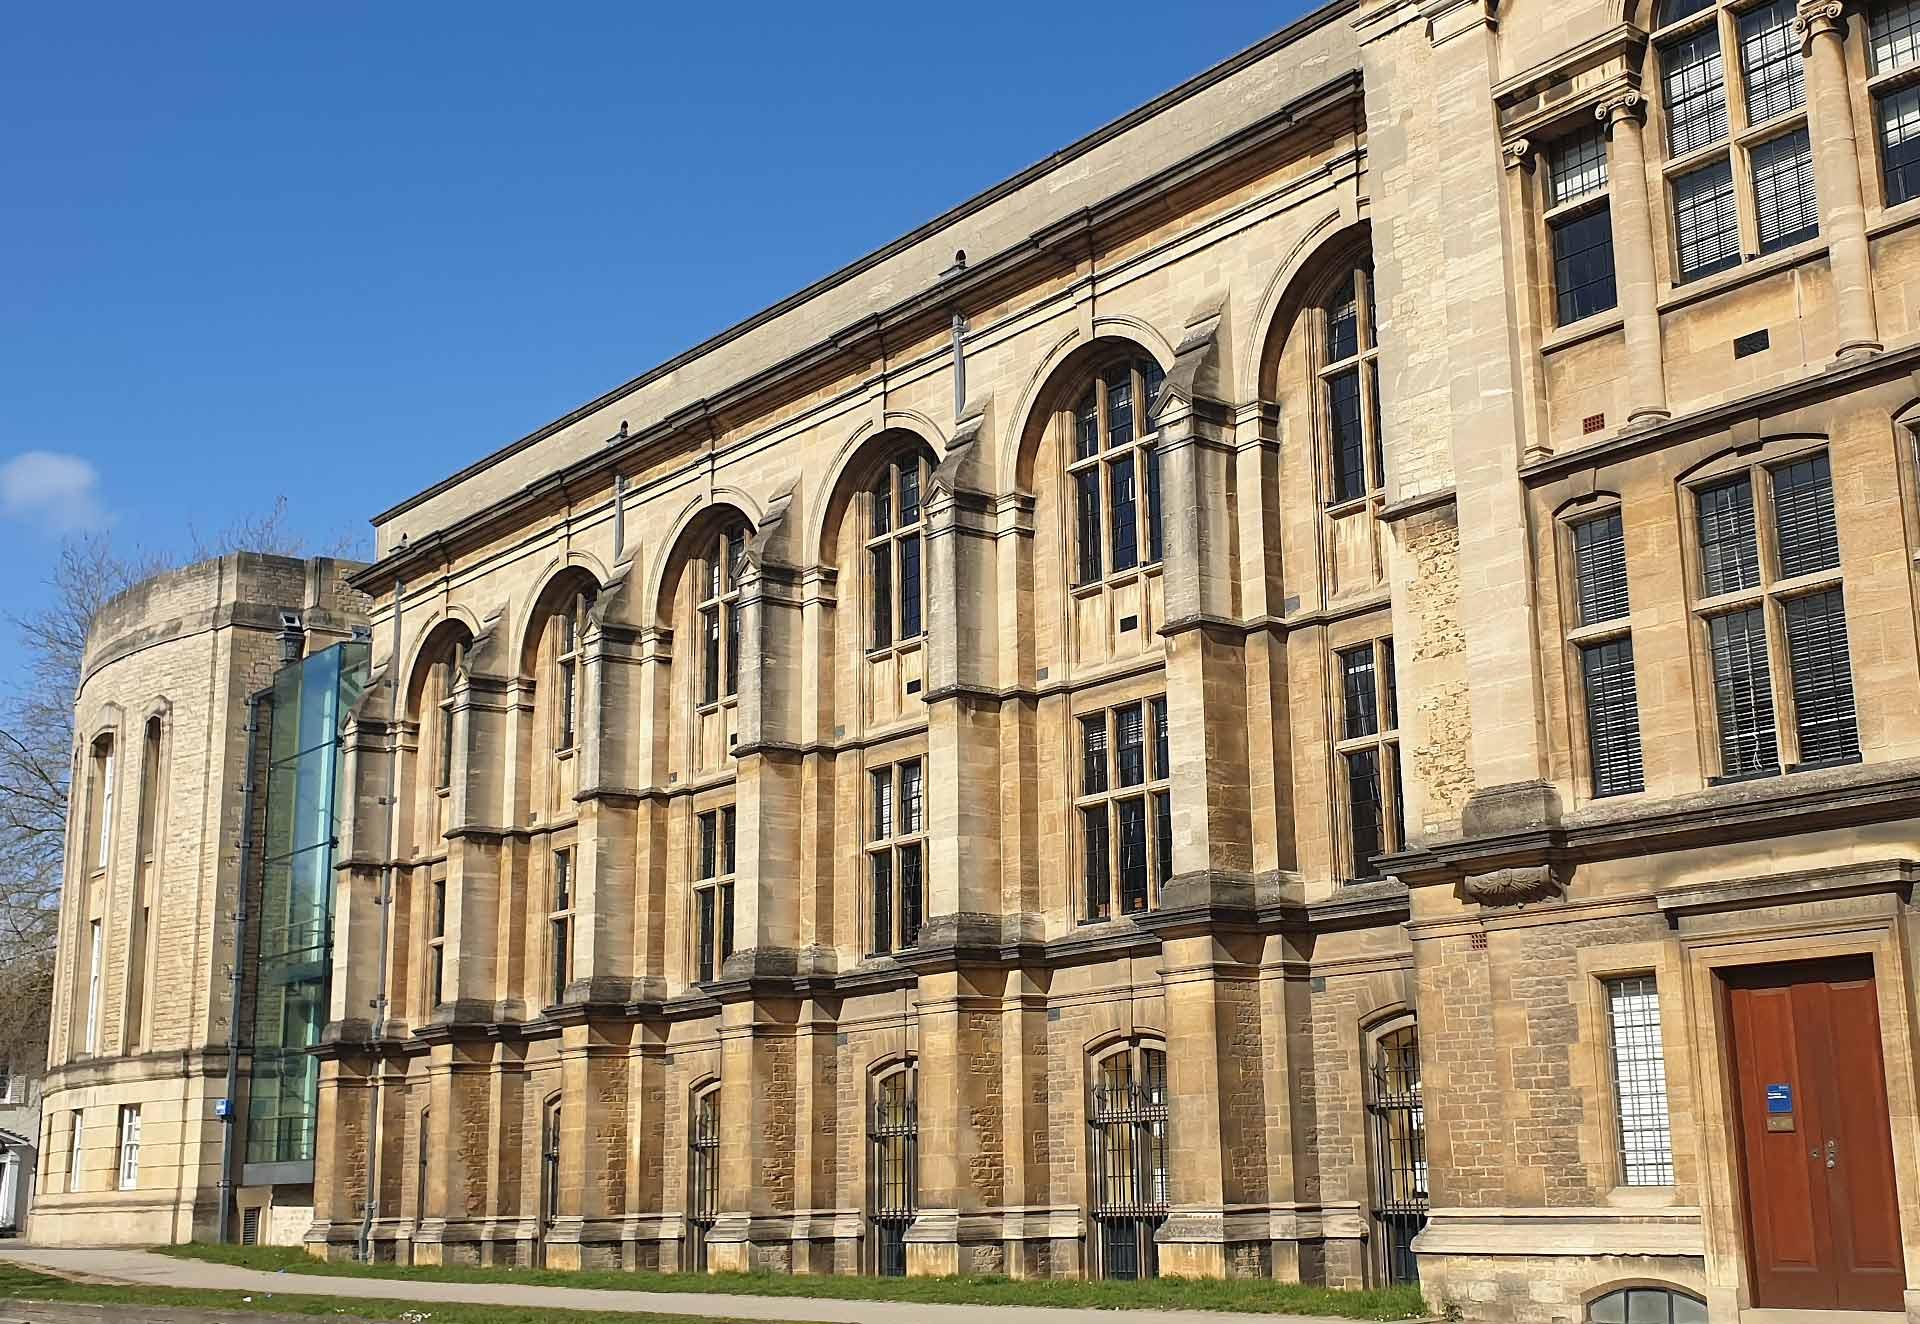 The historic façade of Reuben College in Oxford